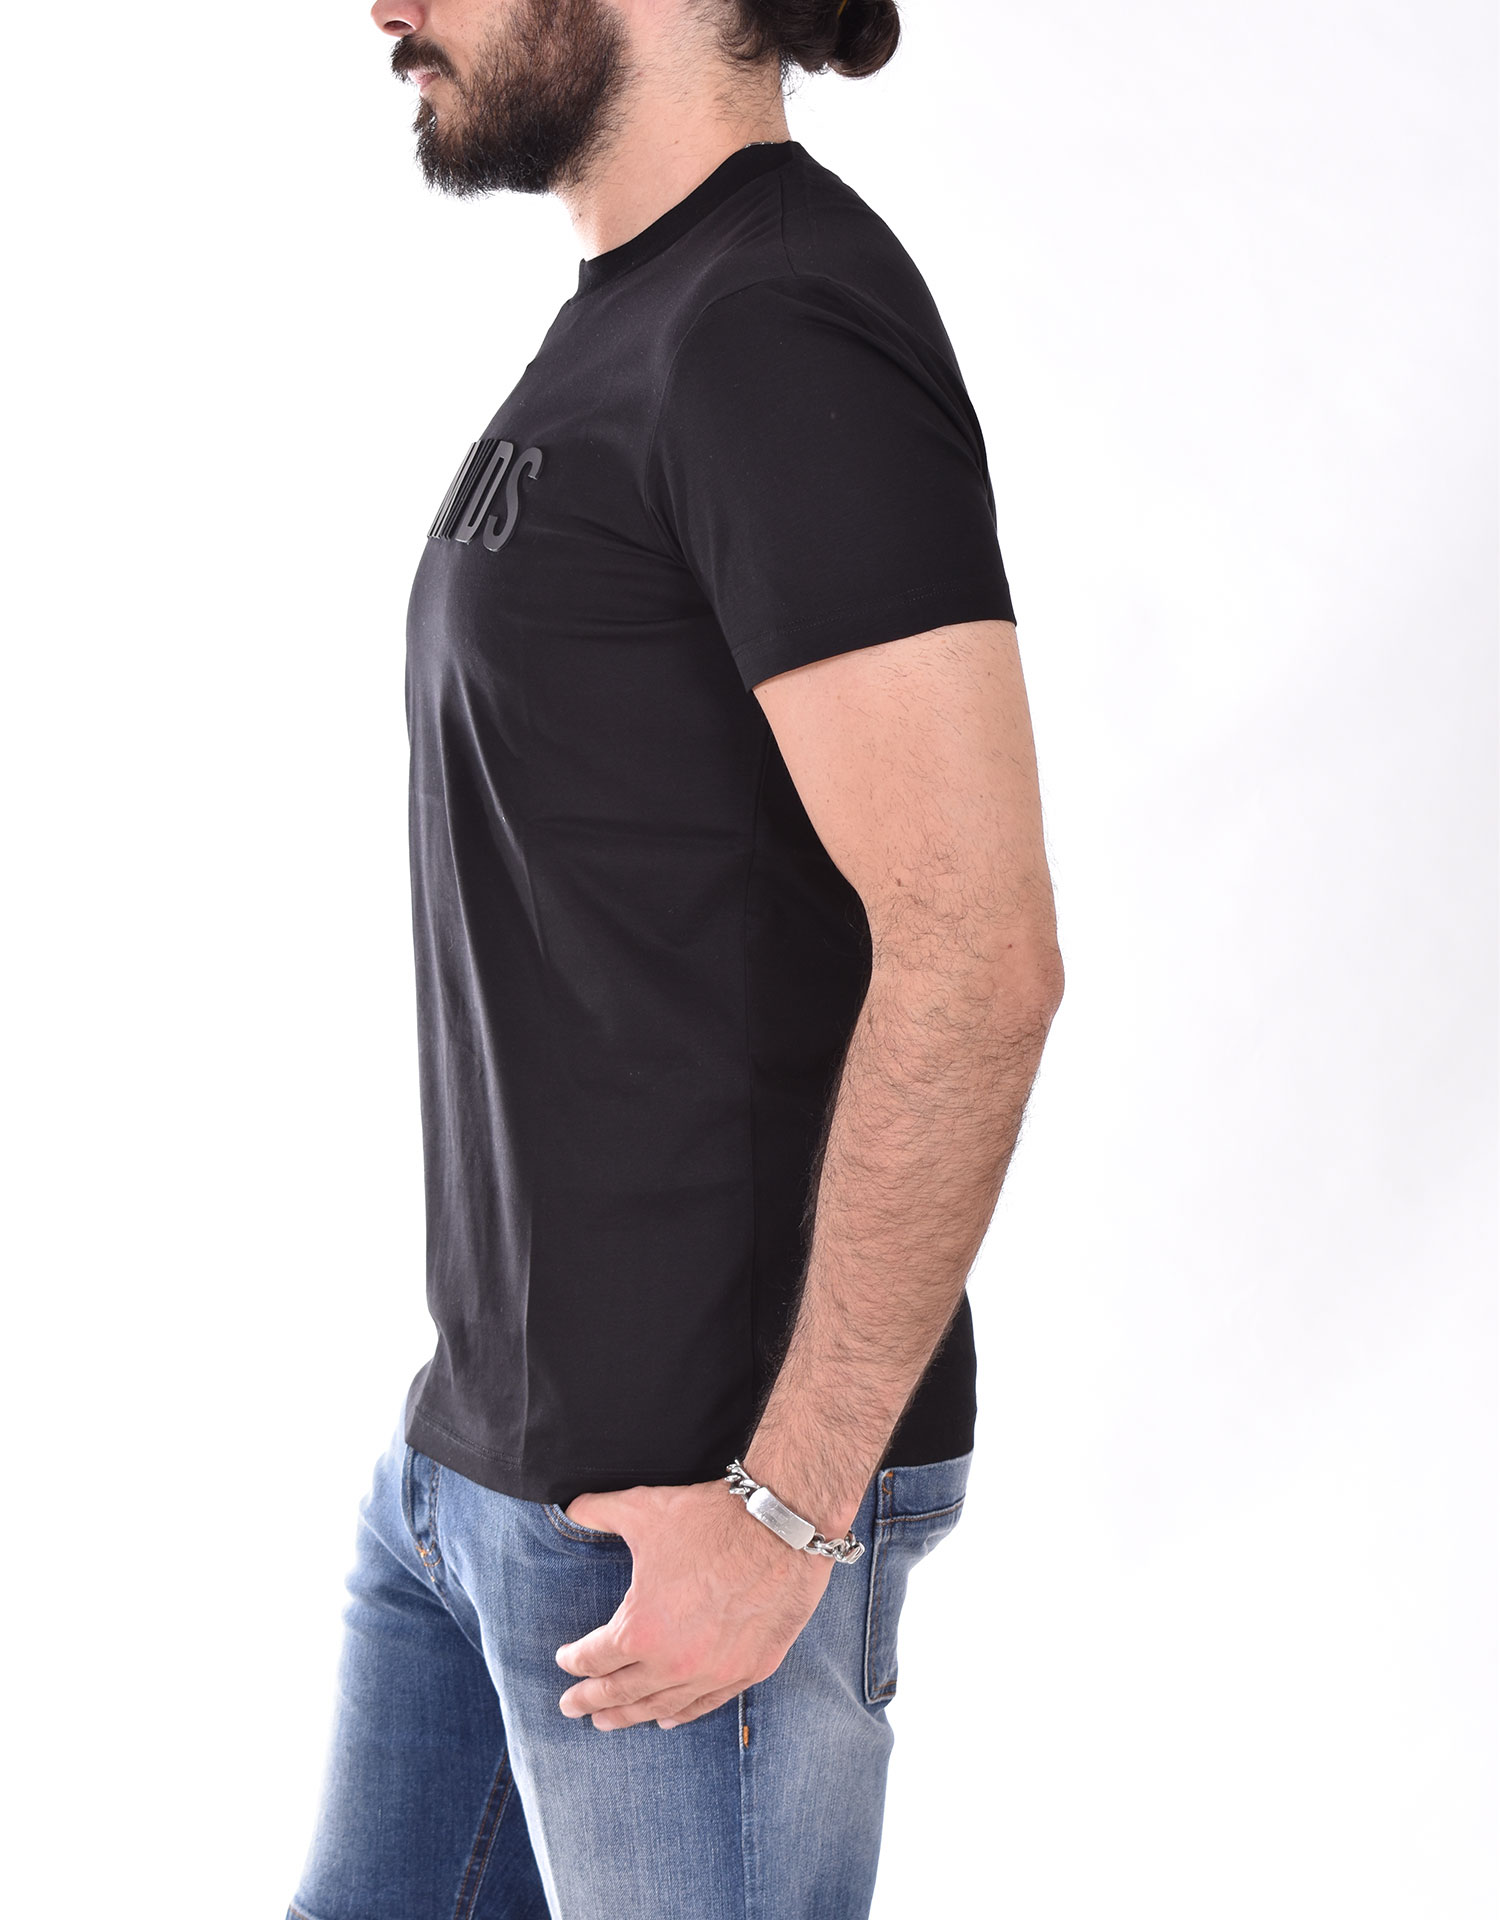 PMDS yannis black t shirt PMDS | 725TS02